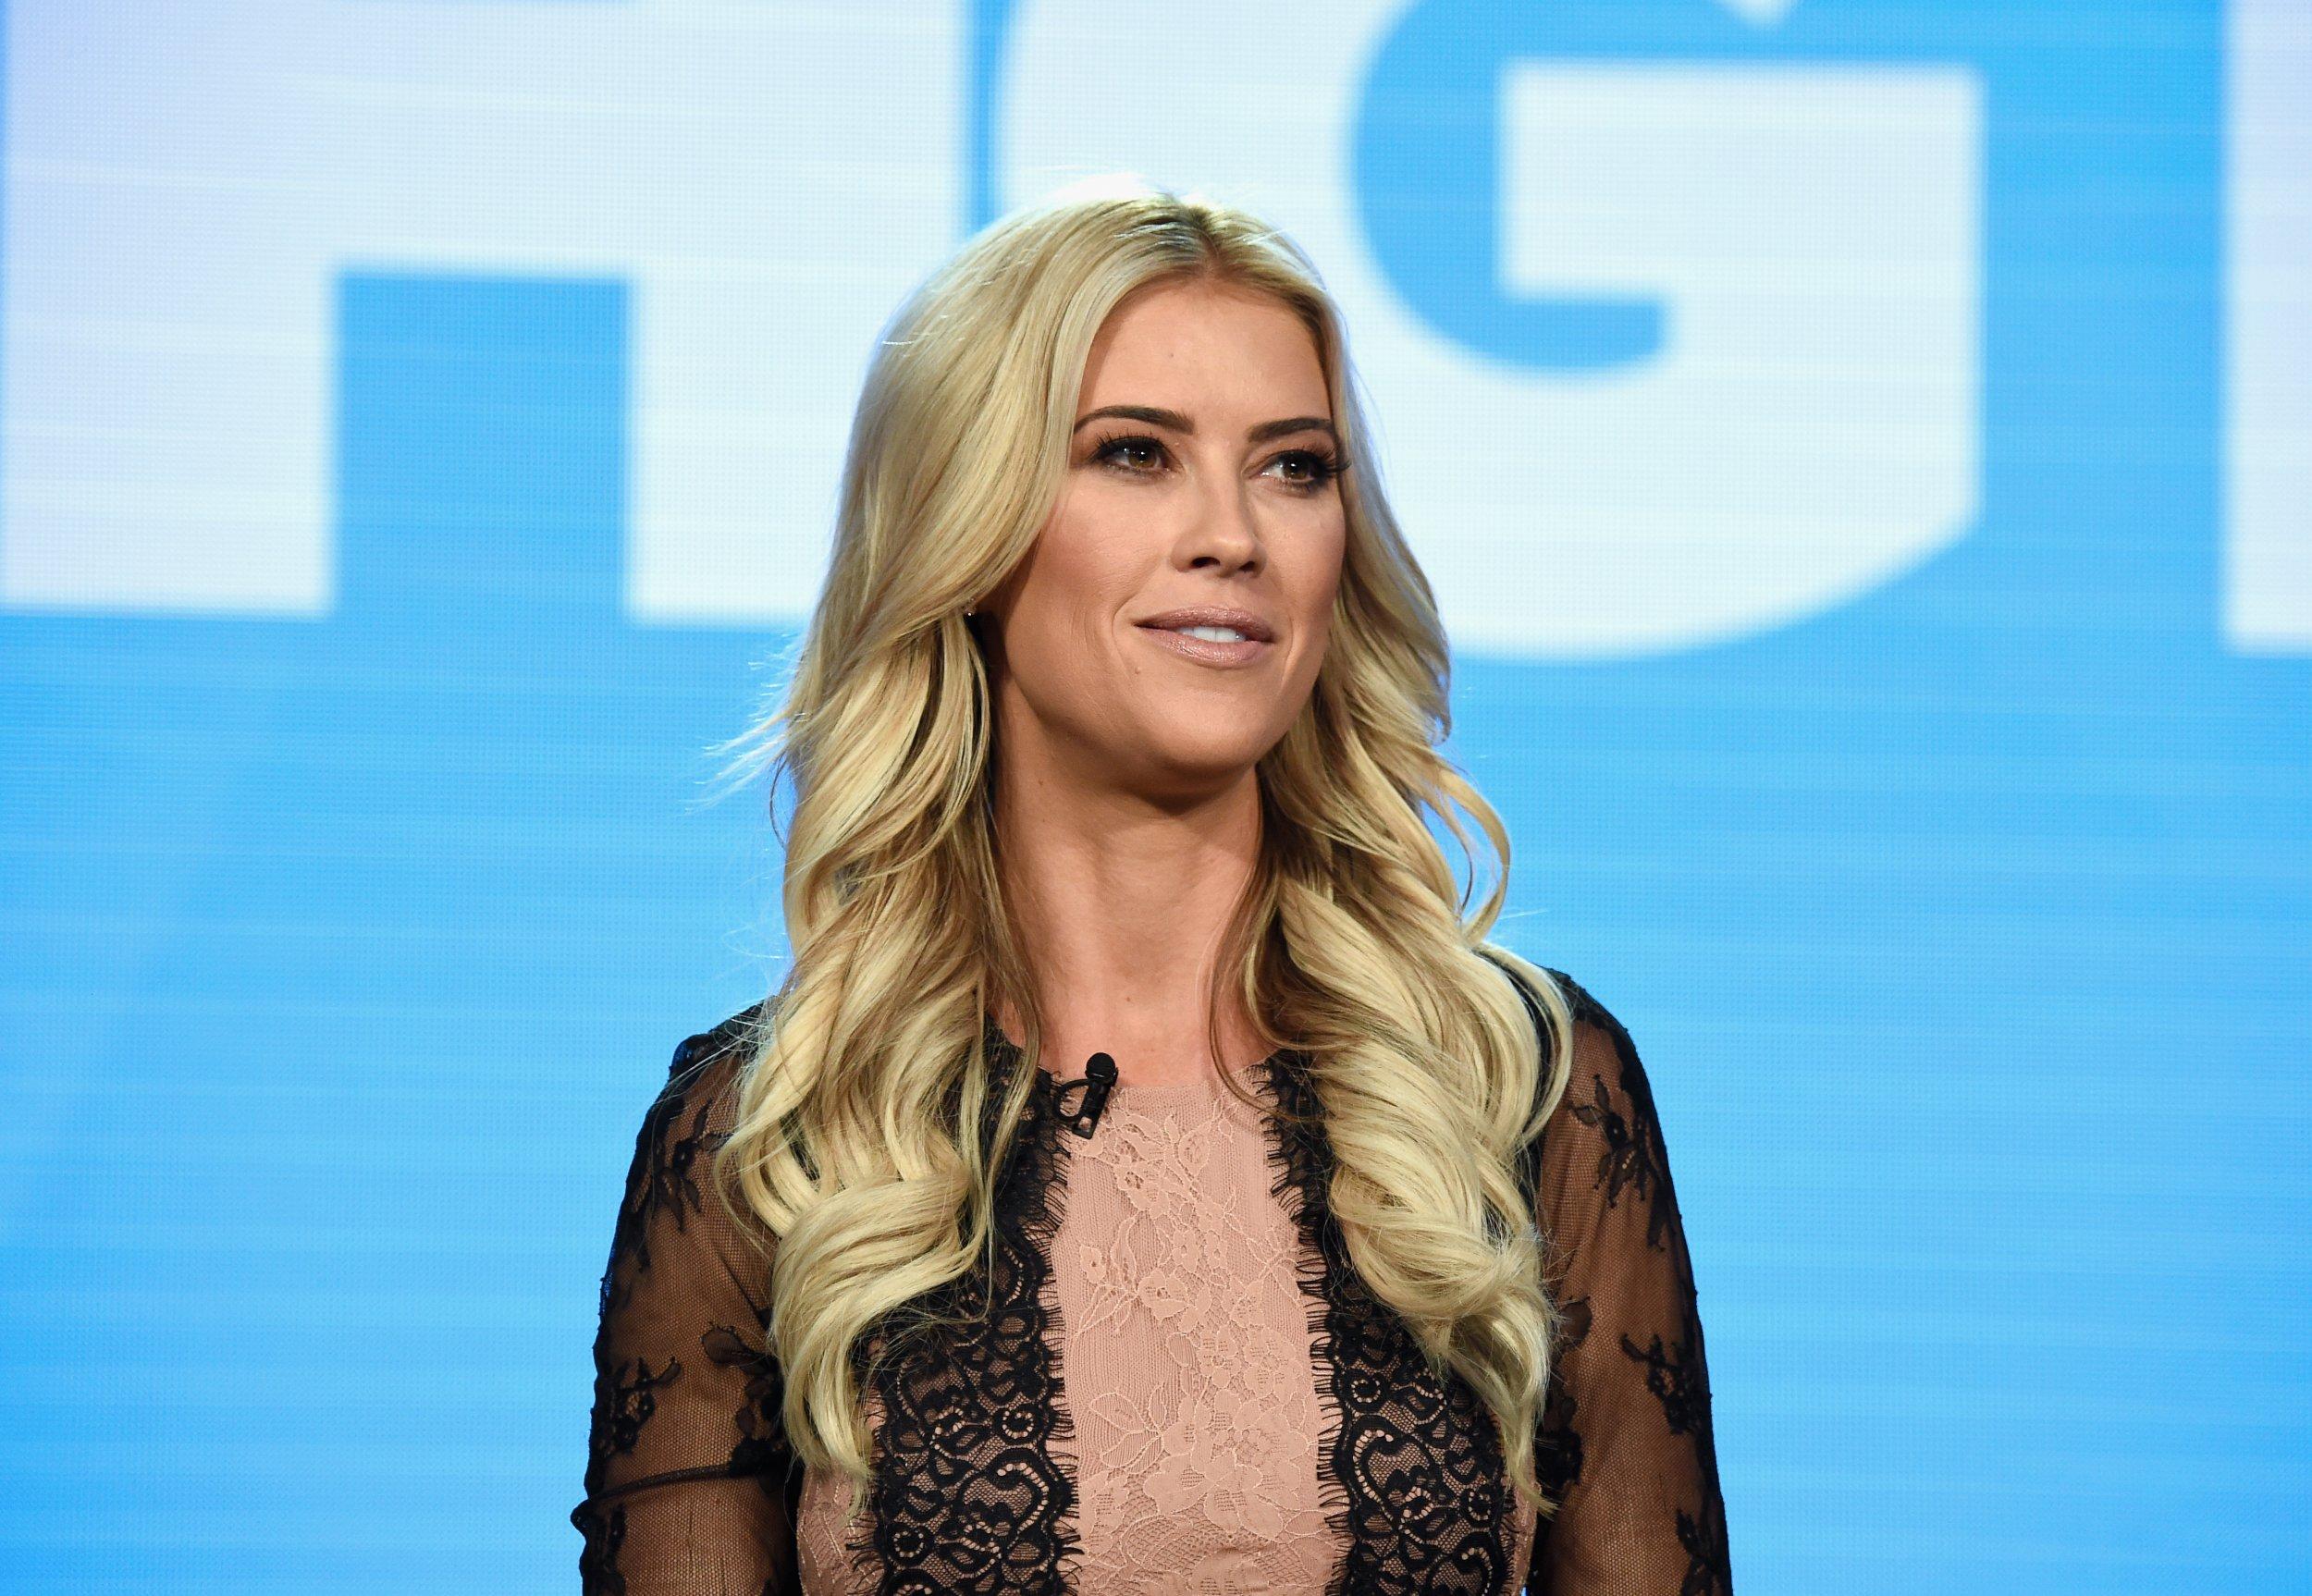 HGTV Star Christina Anstead Talks New Show